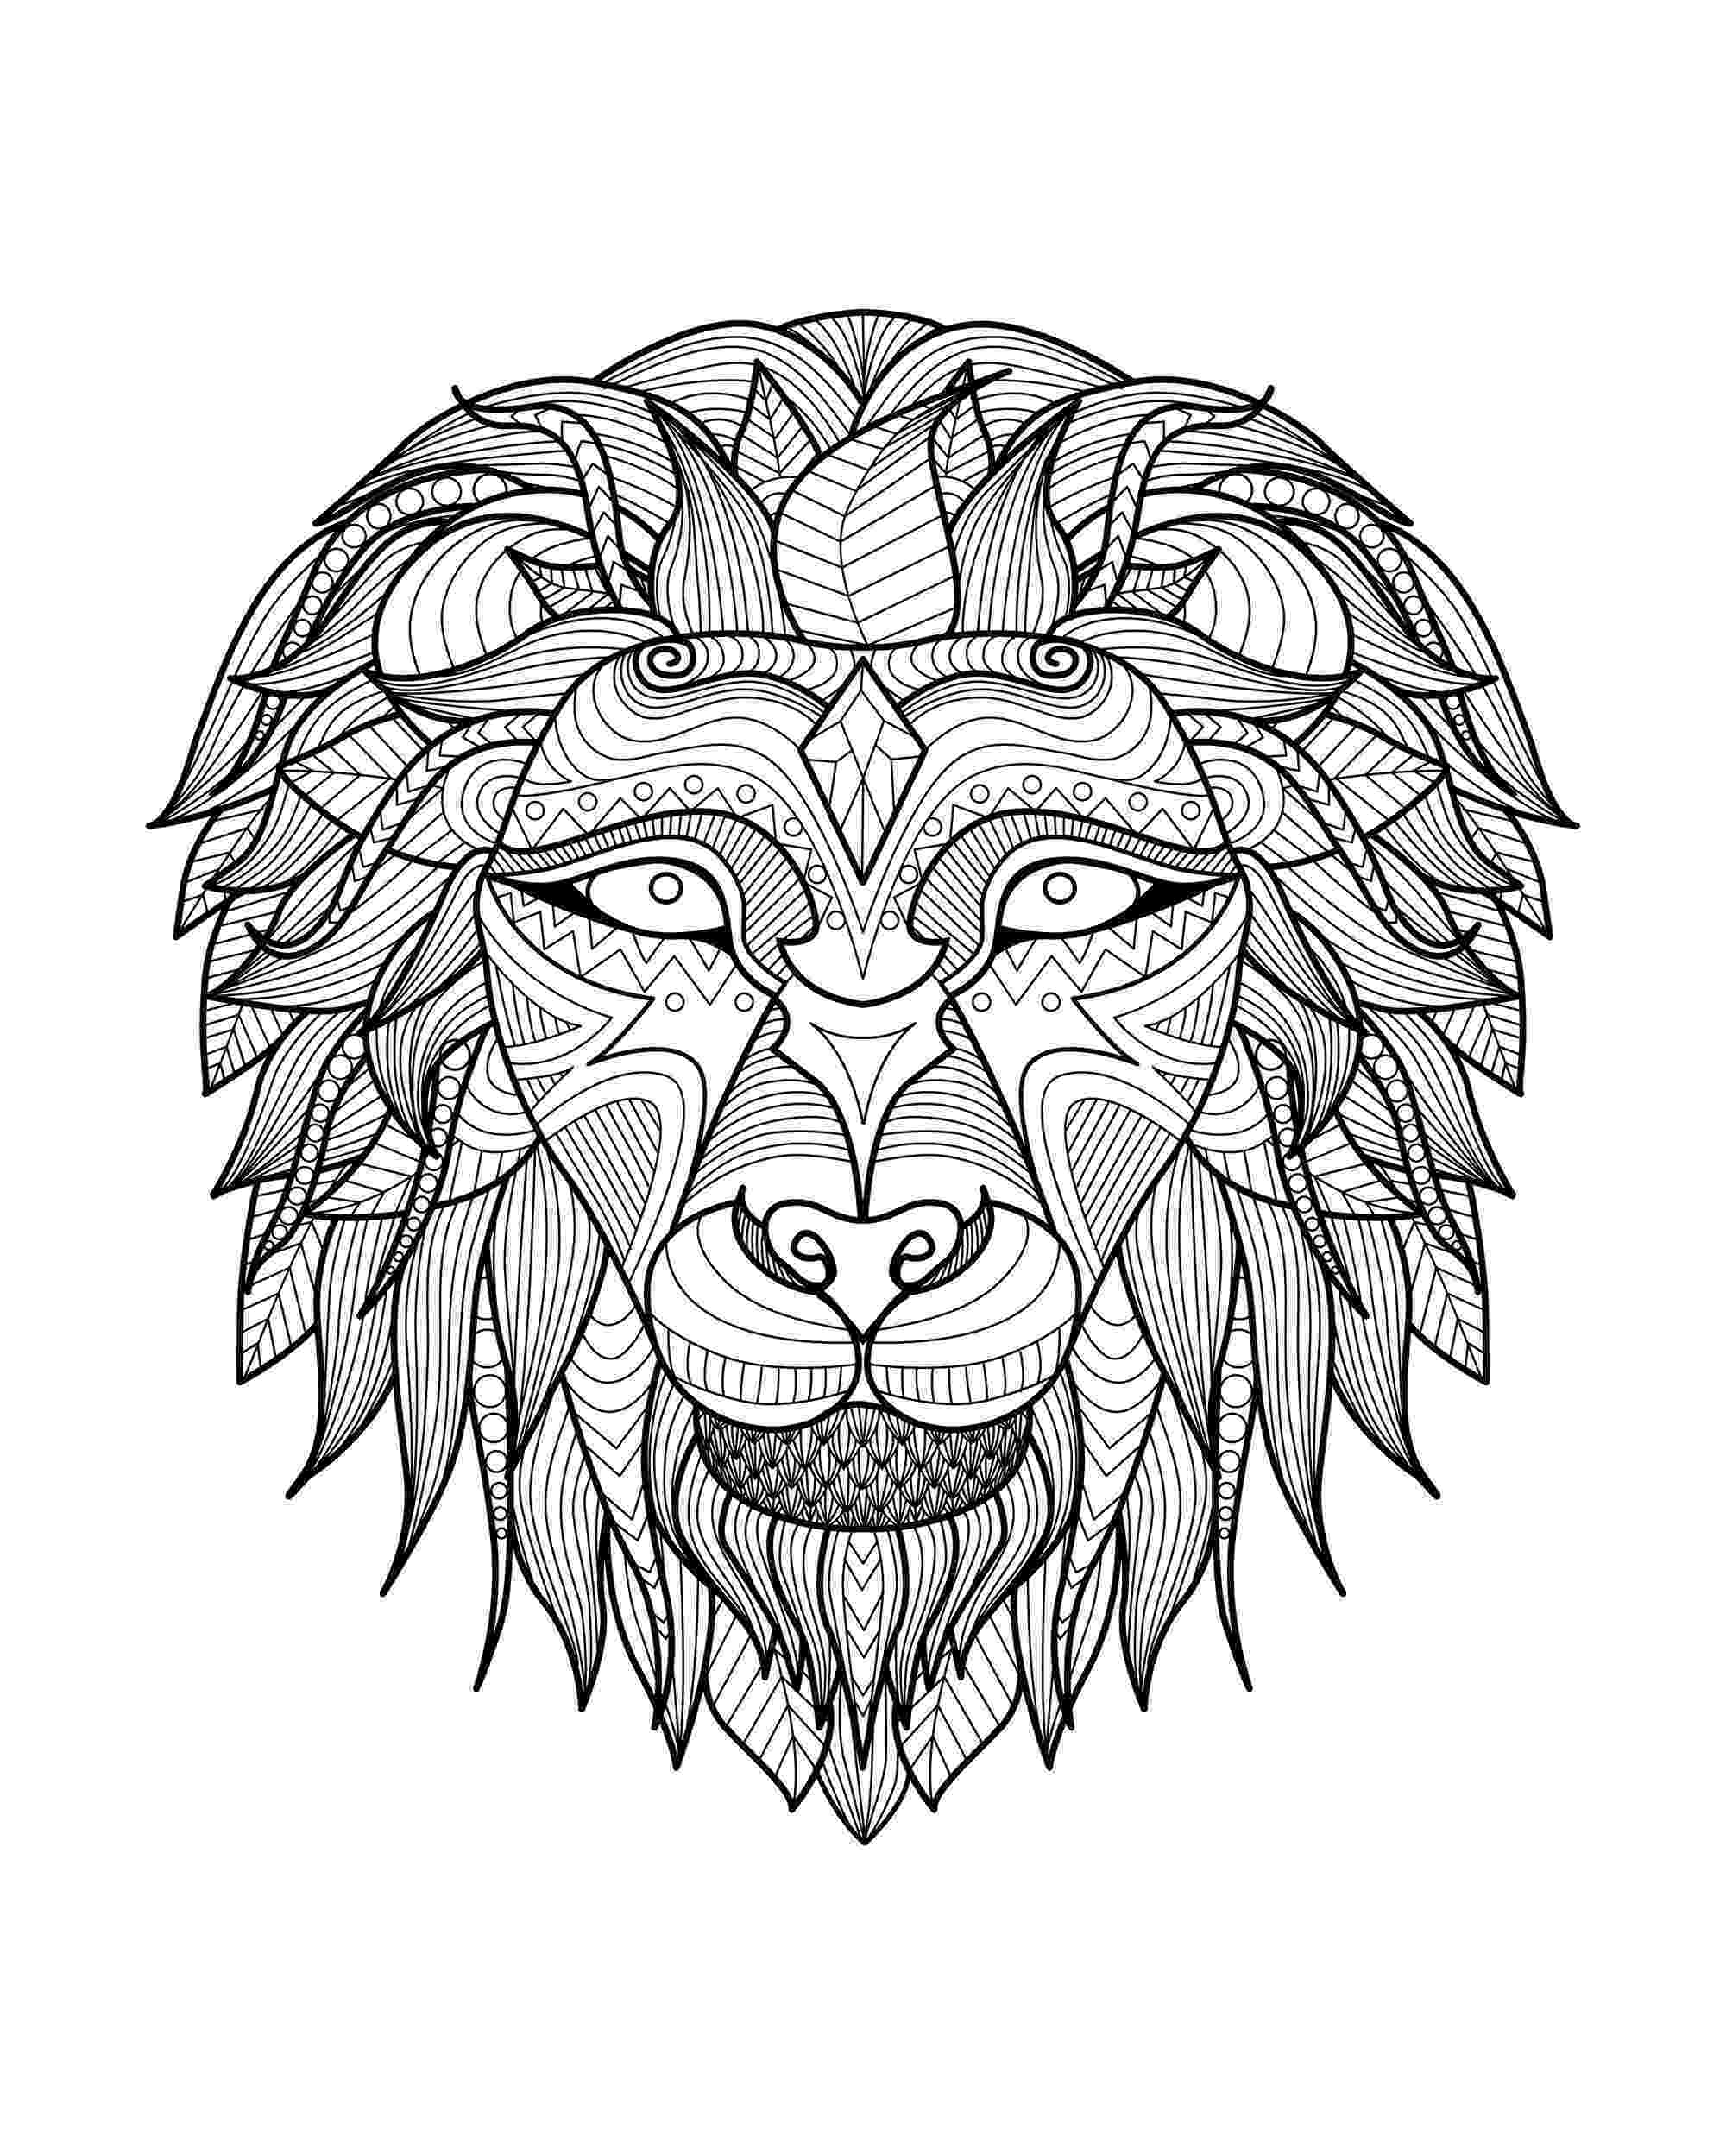 lion head coloring page lion head coloring page arts totallypic adult coloring lion head page